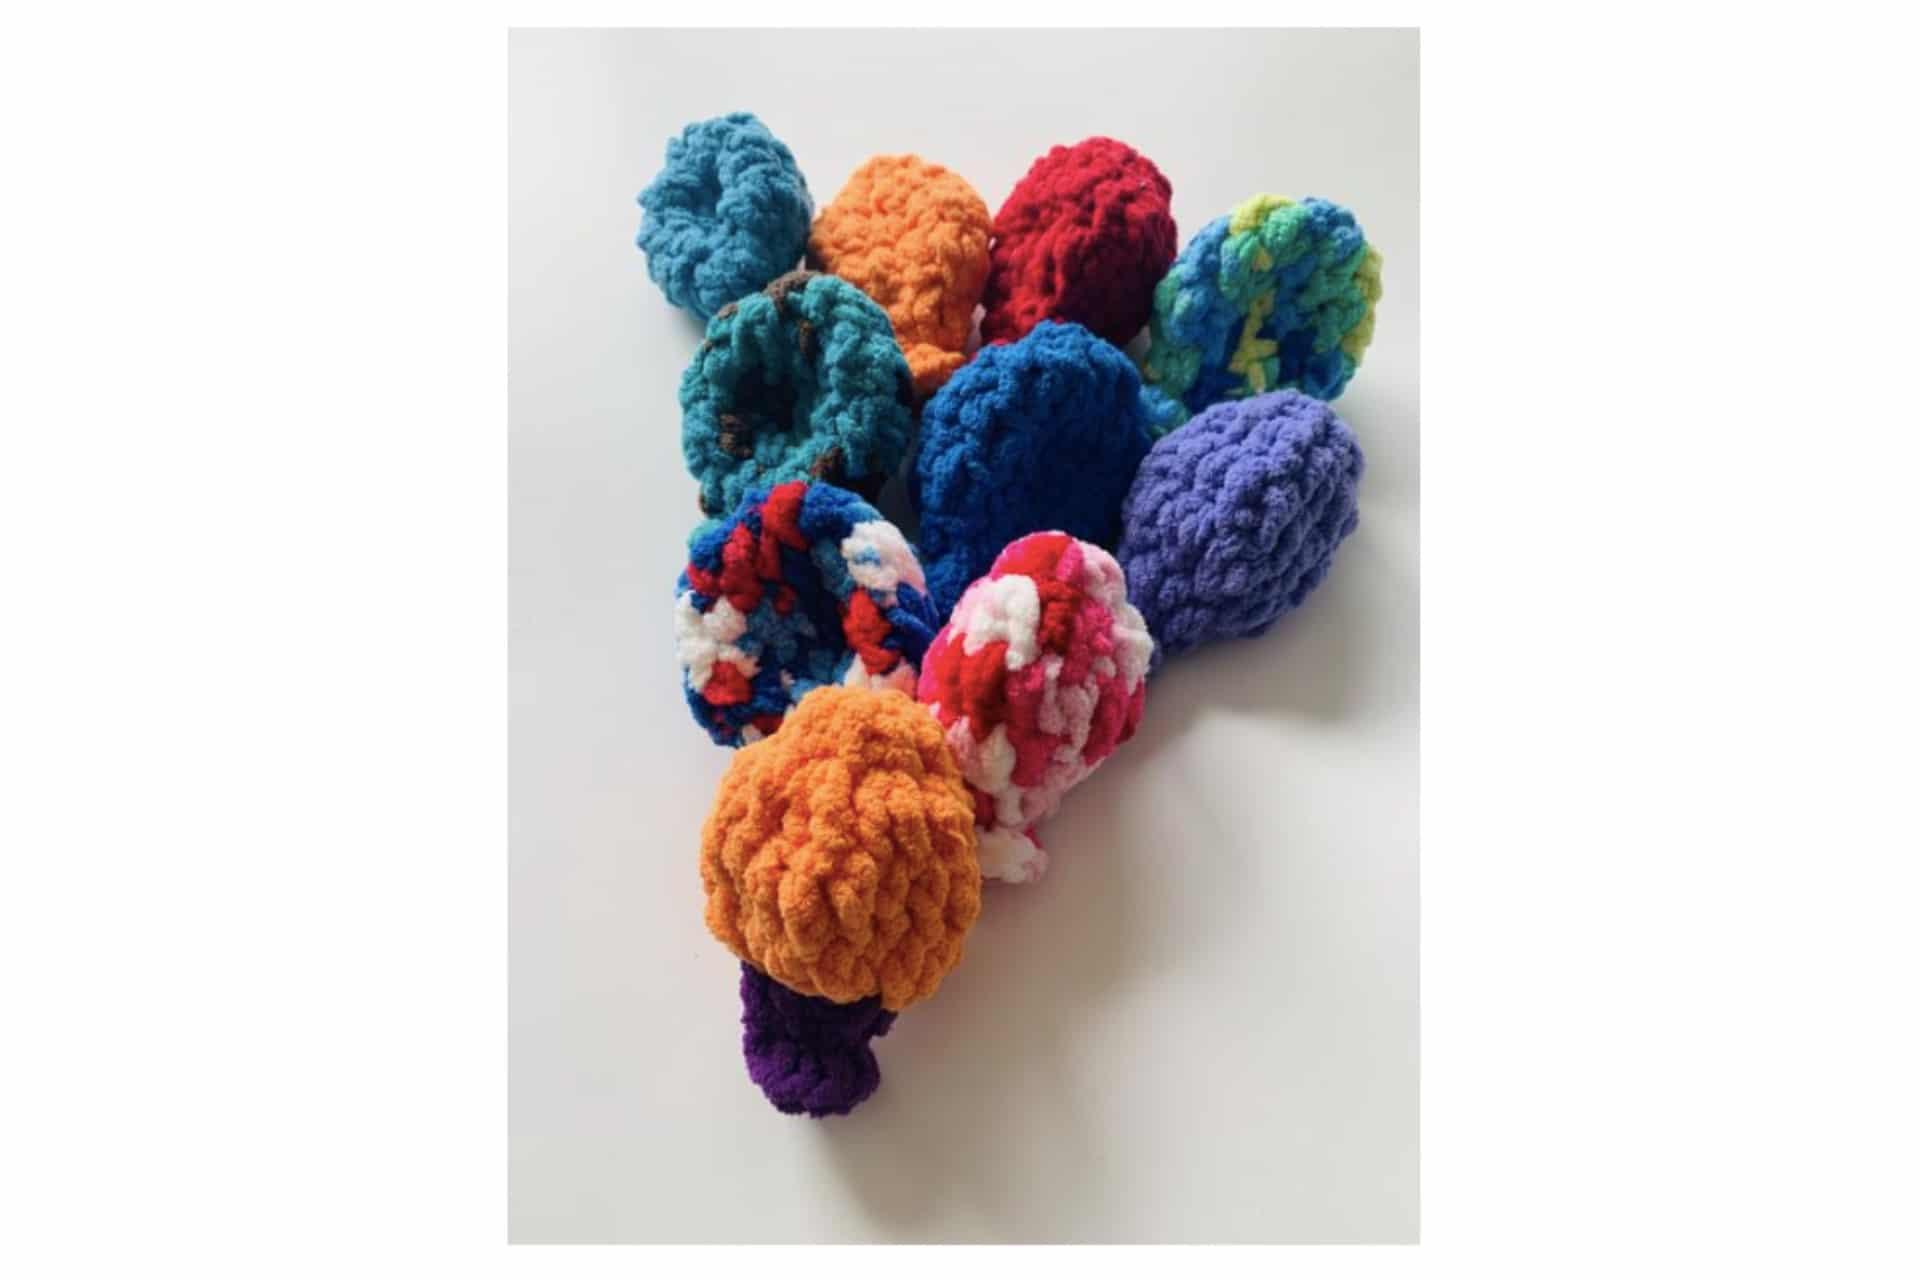 Multicoloured yarn water balloons